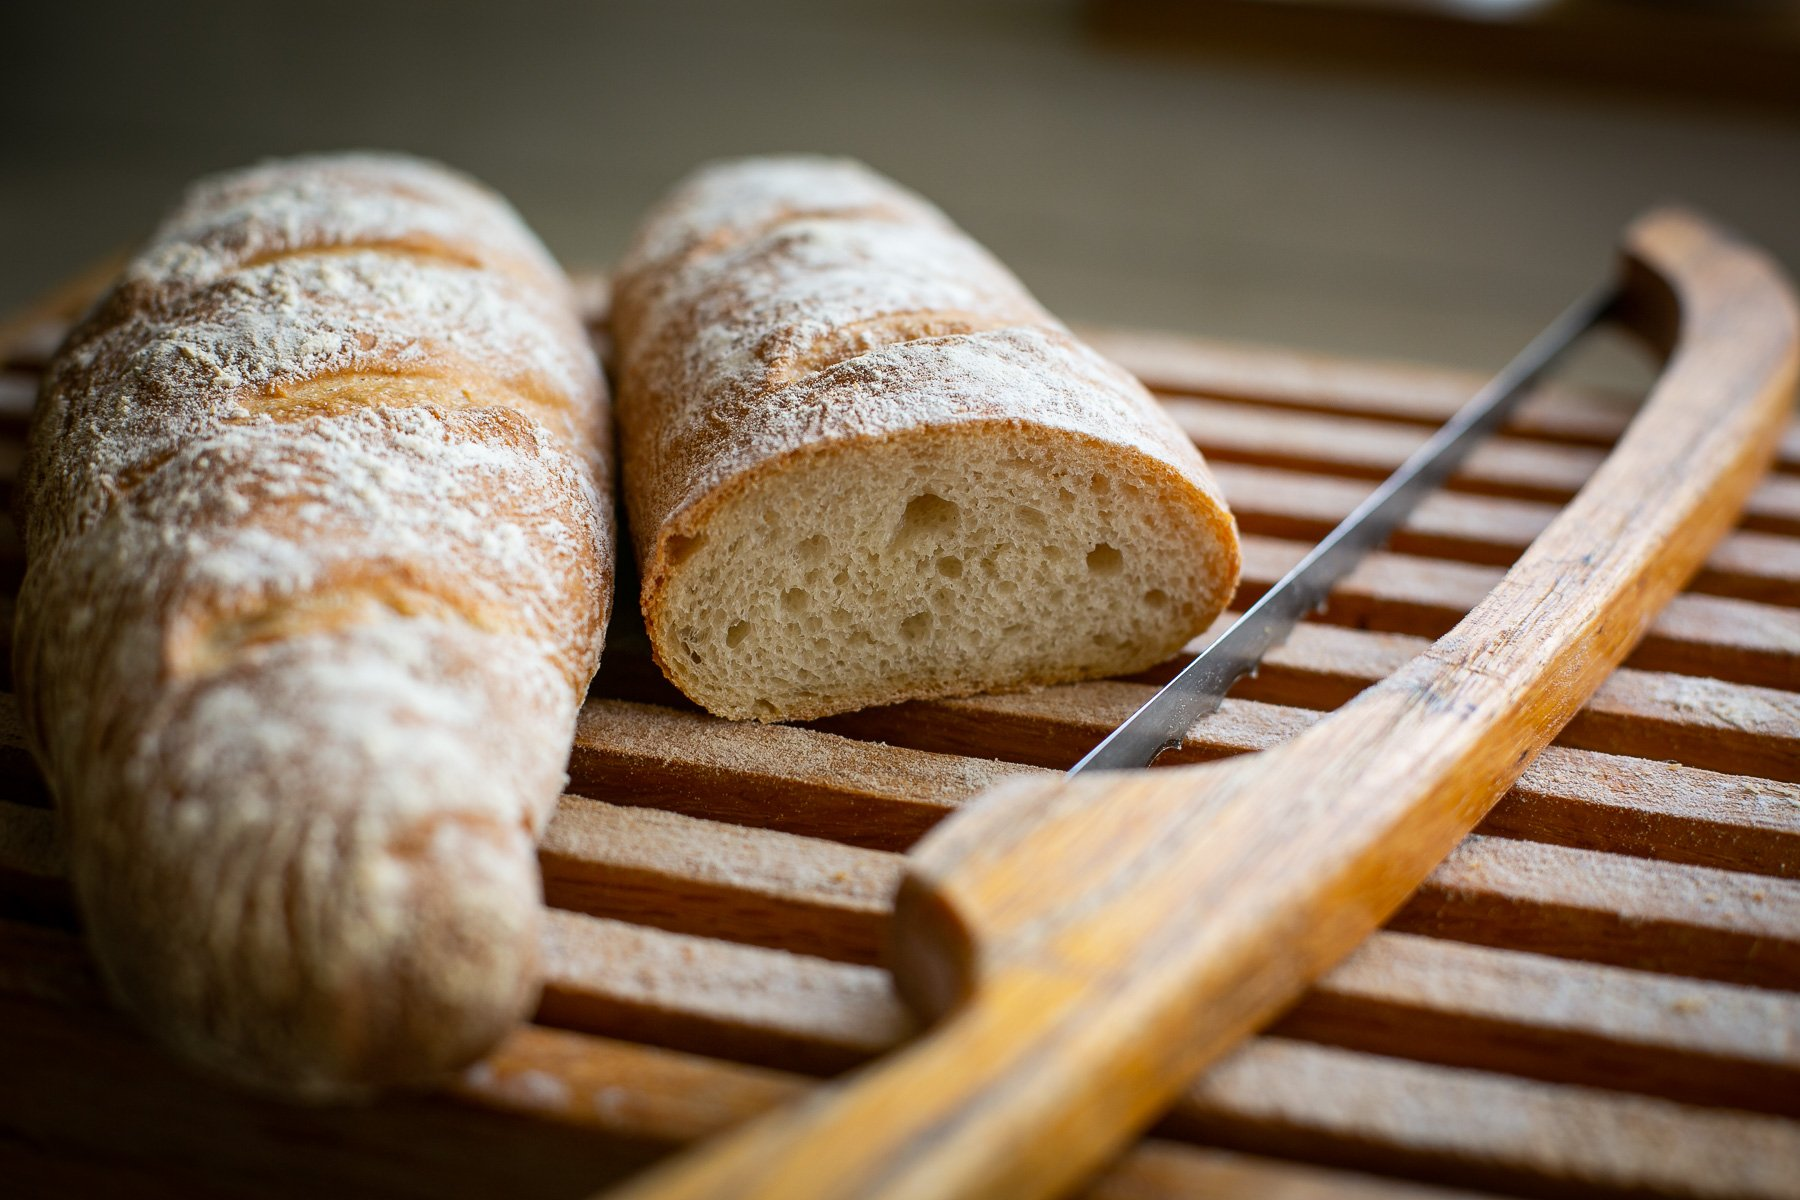 Sliced french baguette